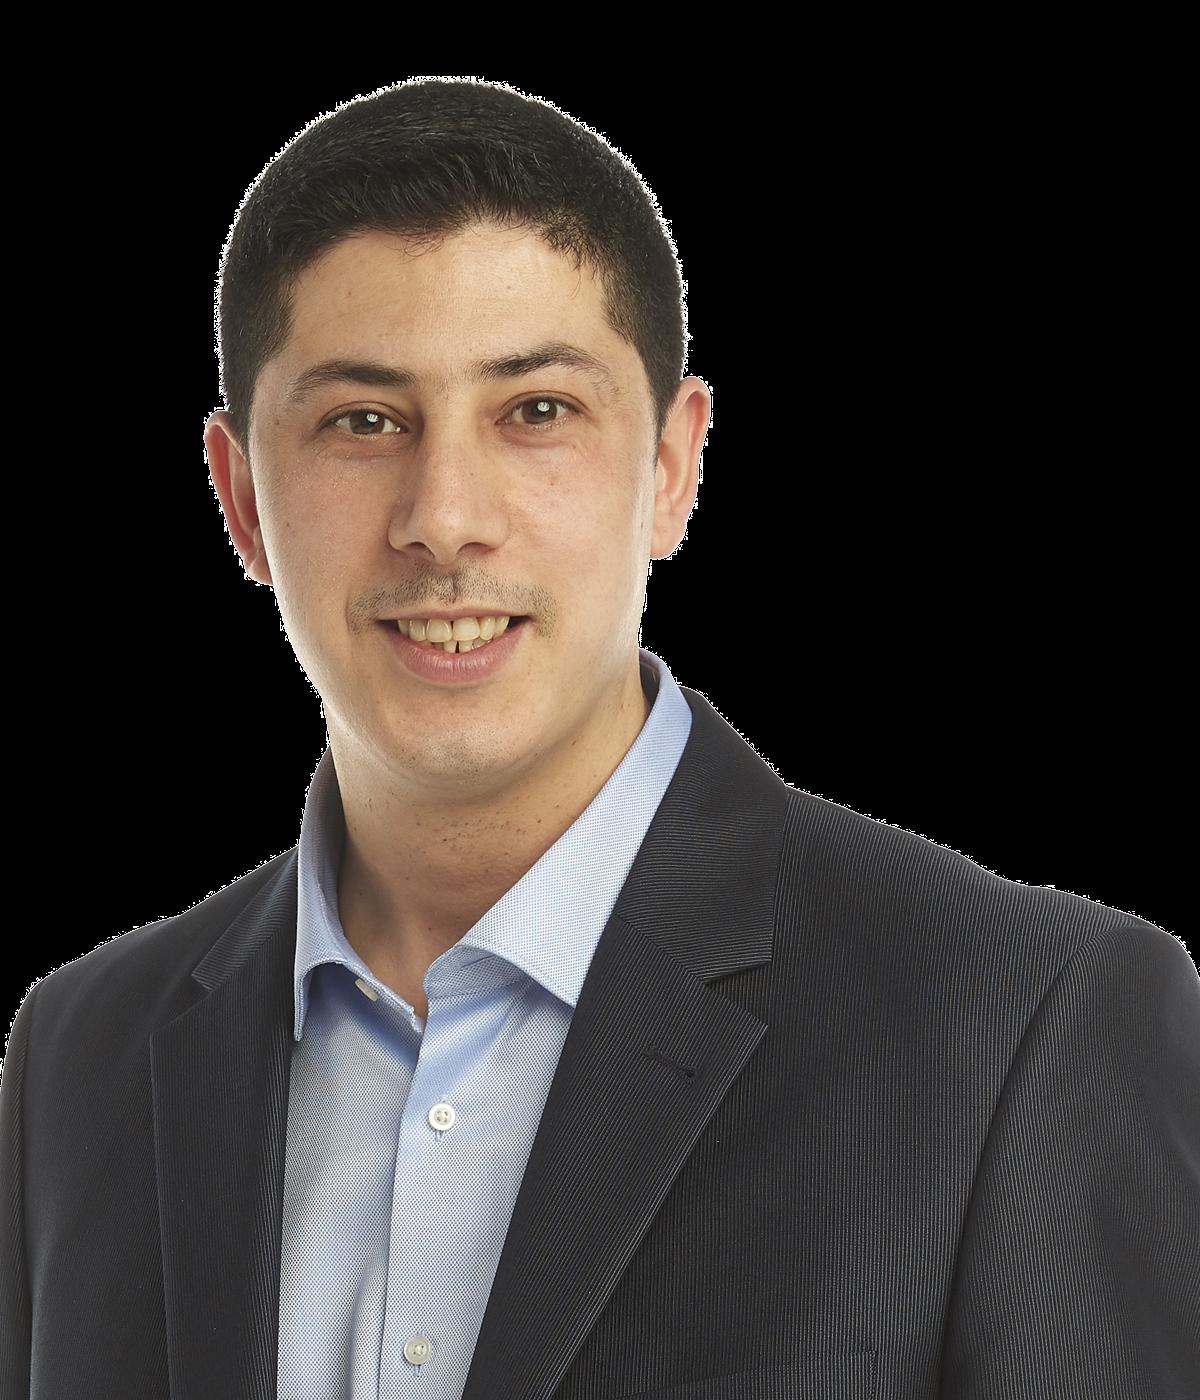 Hamid Akaychouh